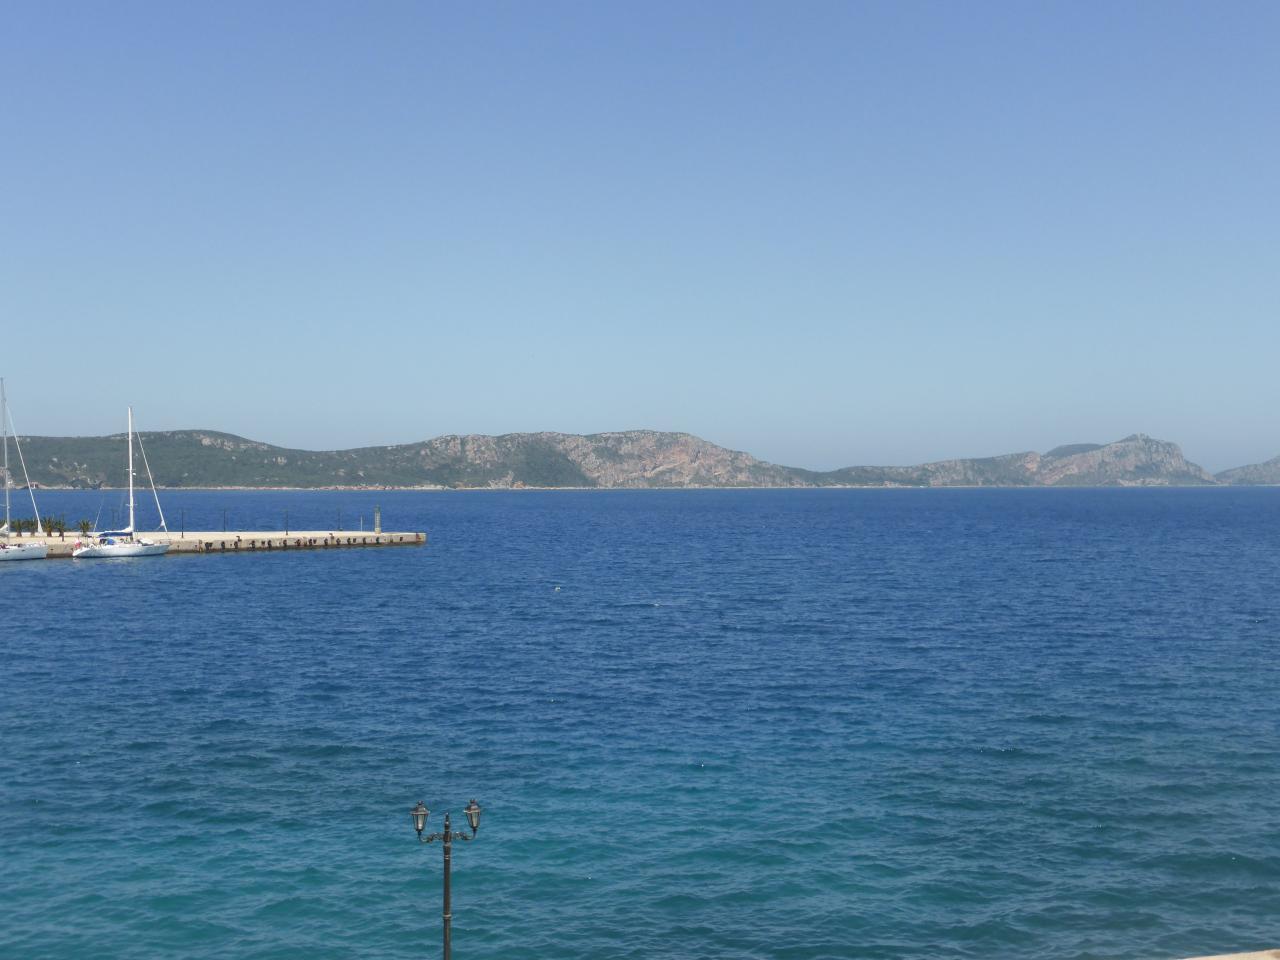 la baie de NAVARIN